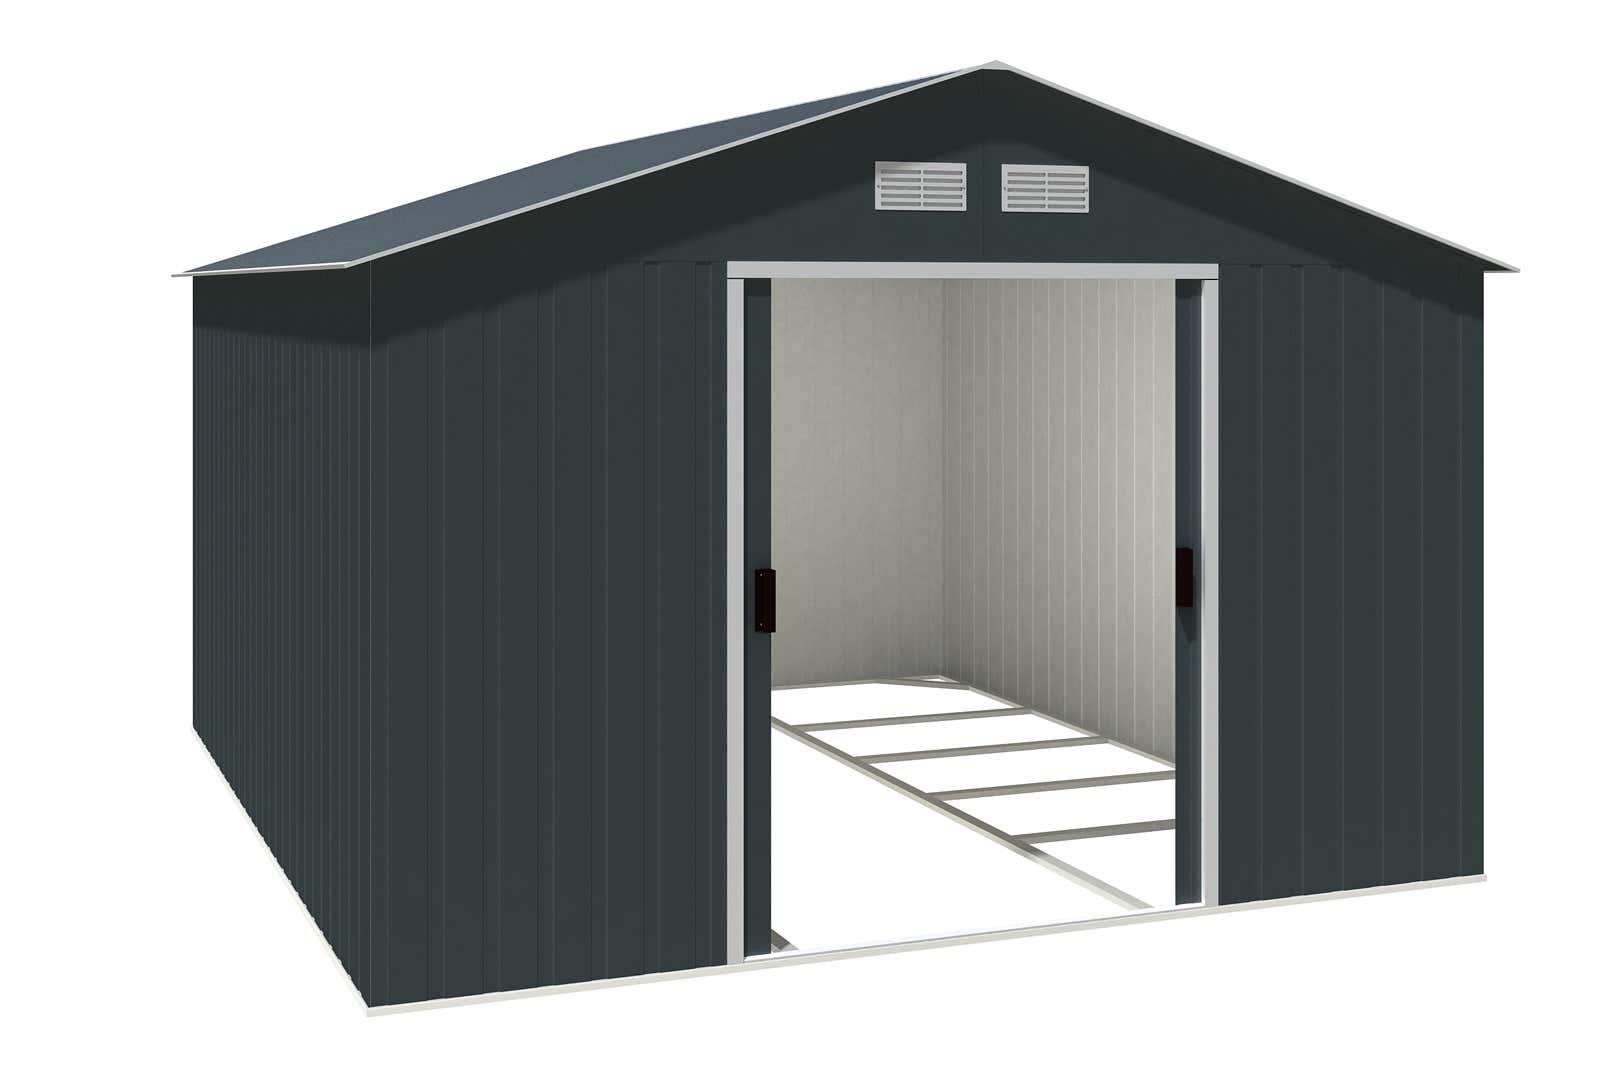 metallger tehaus colossus 10x12 anthrazit 7248 a z. Black Bedroom Furniture Sets. Home Design Ideas